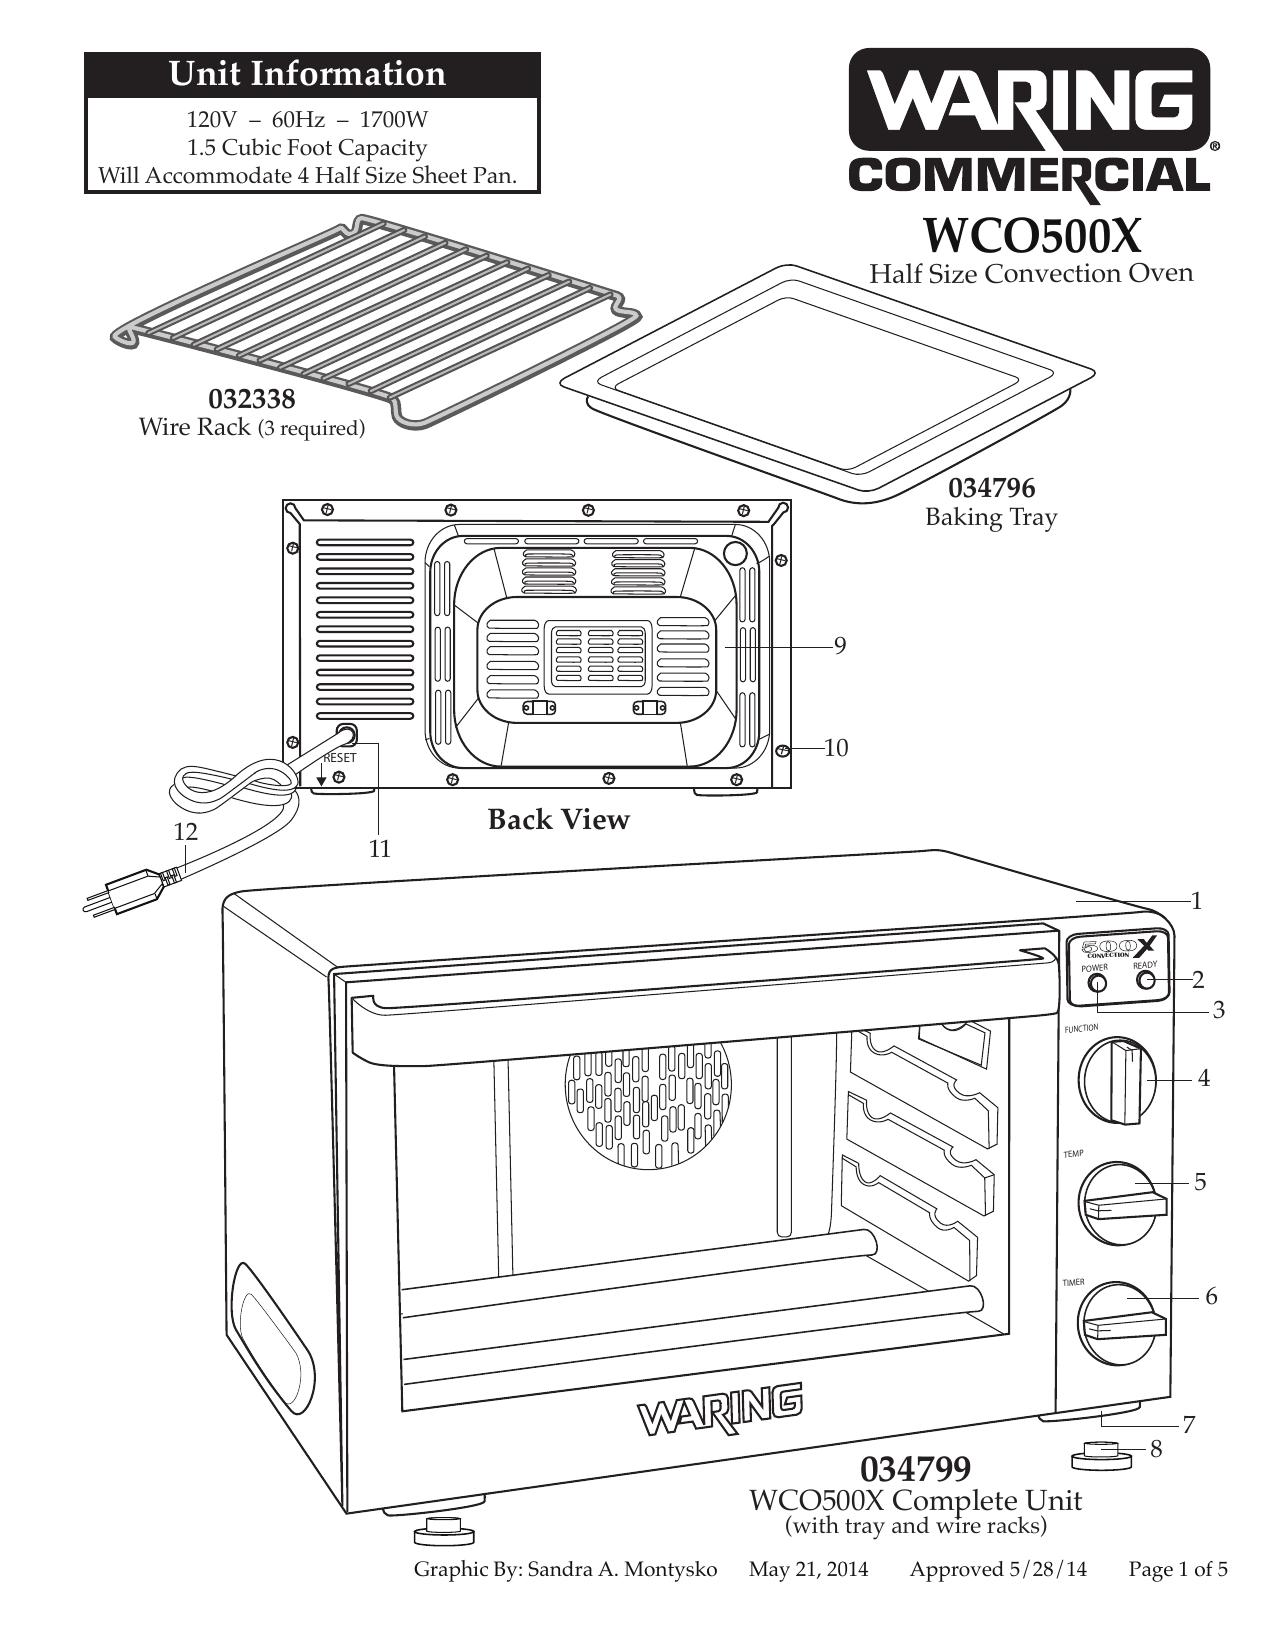 Waring WCO500X Half-Size Convection Oven Parts Diagram